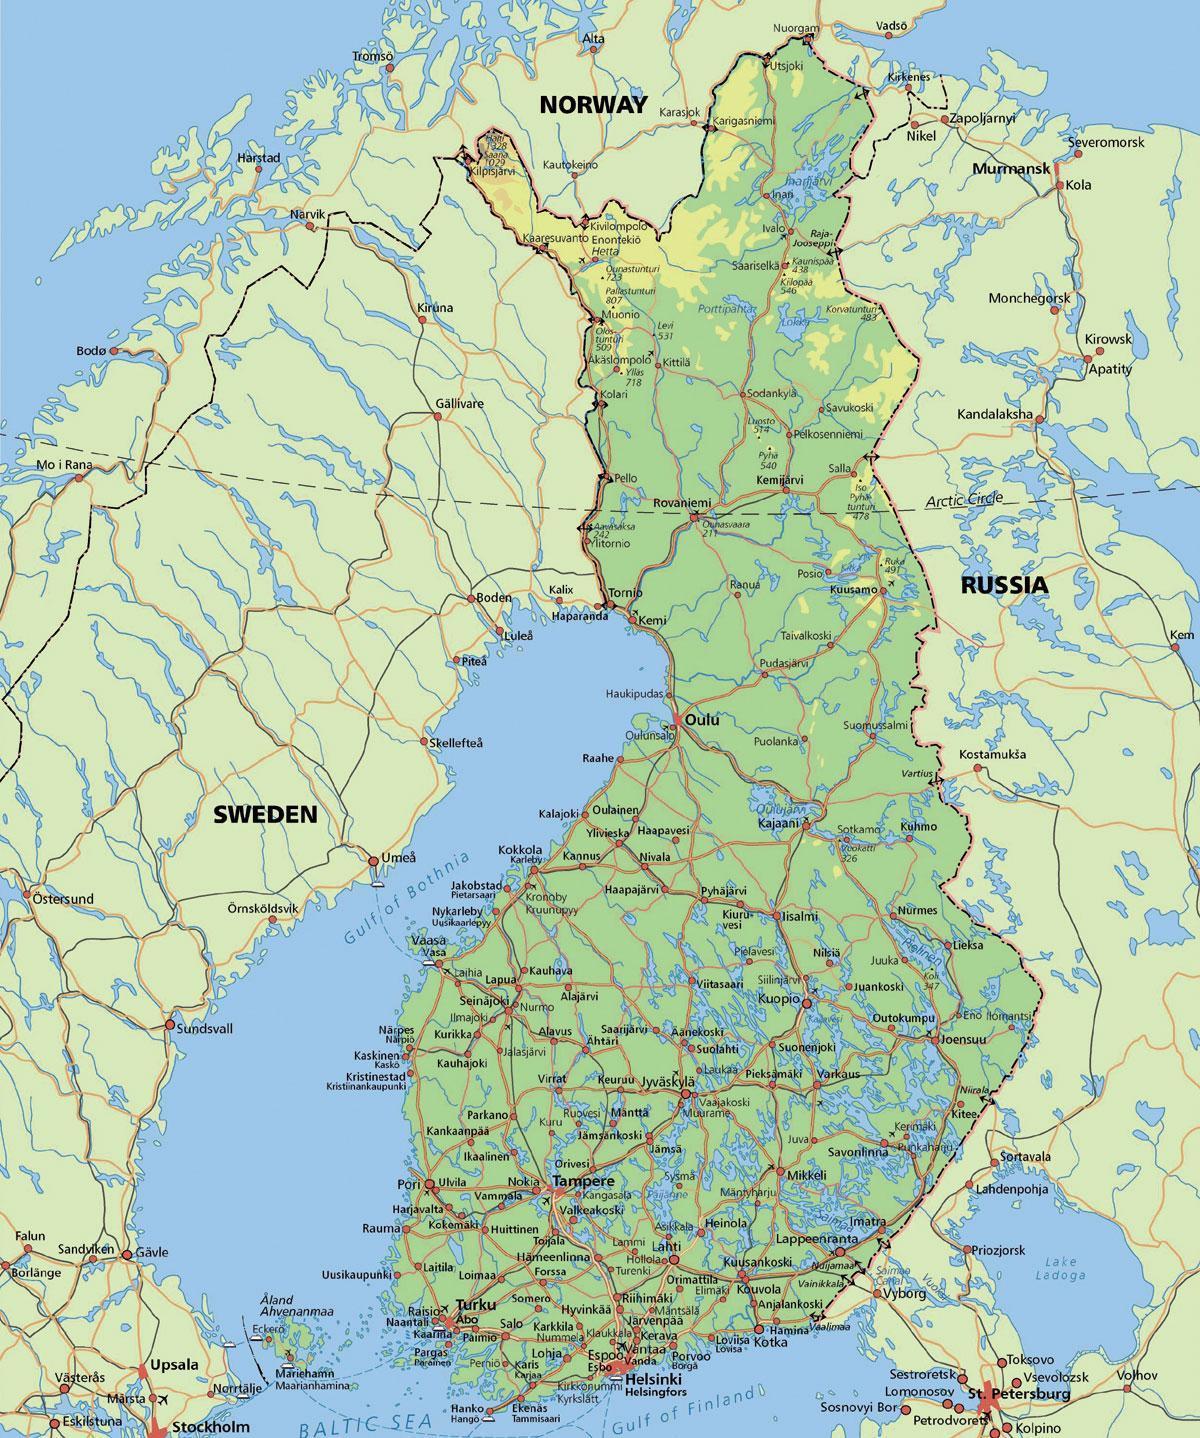 Arctic Circle Finland Kort Kort Over Polarcirklen I Finland I